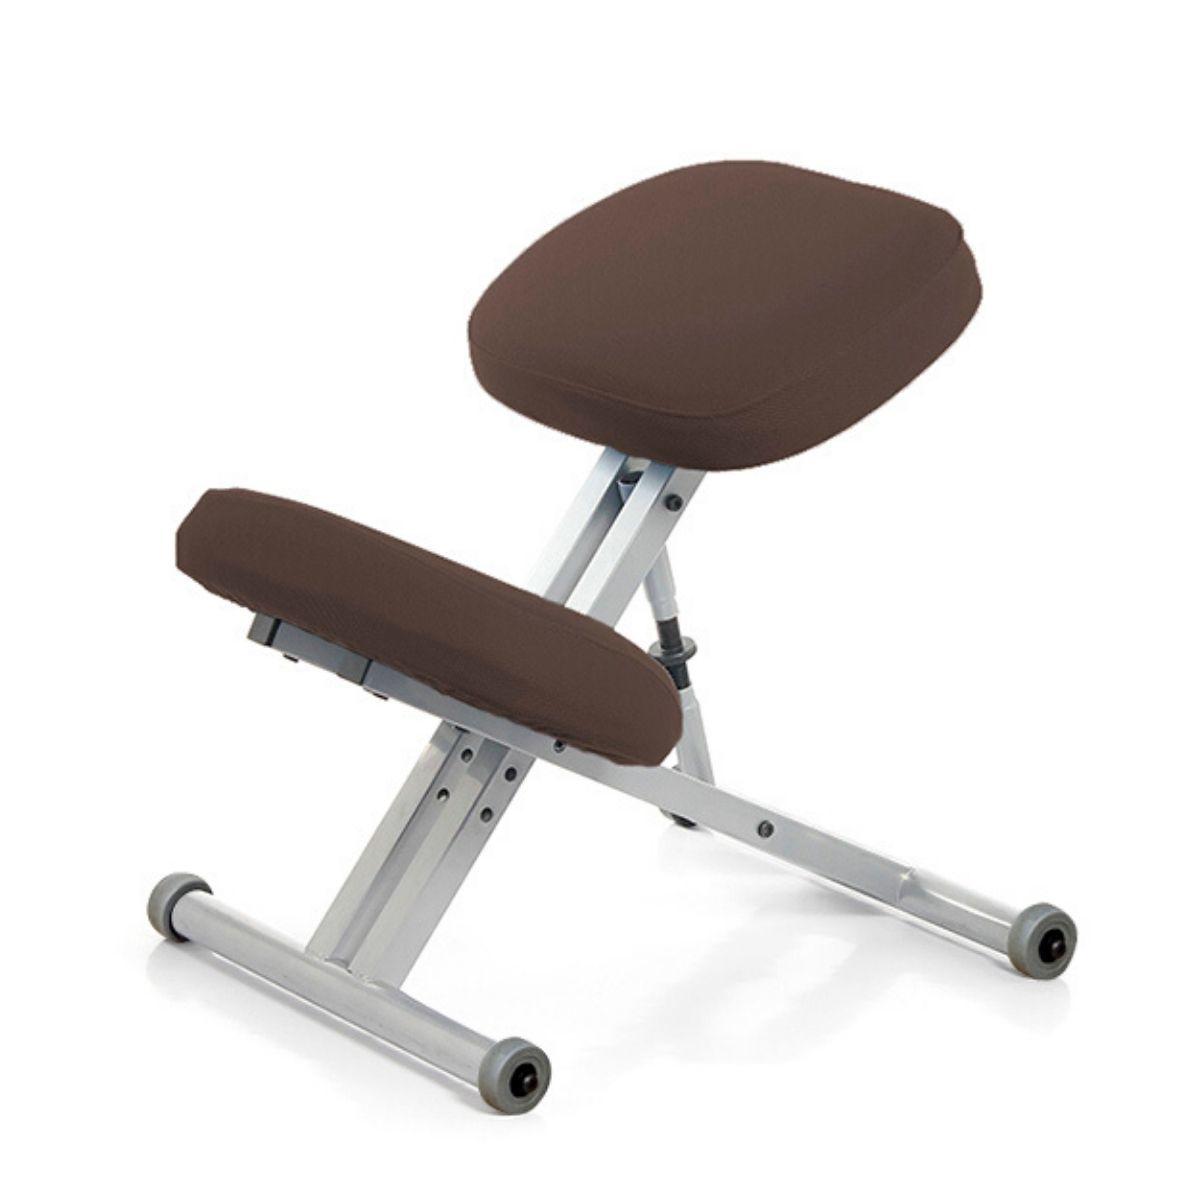 Стул коленный Smartstool KM01 без газлифта коричневый